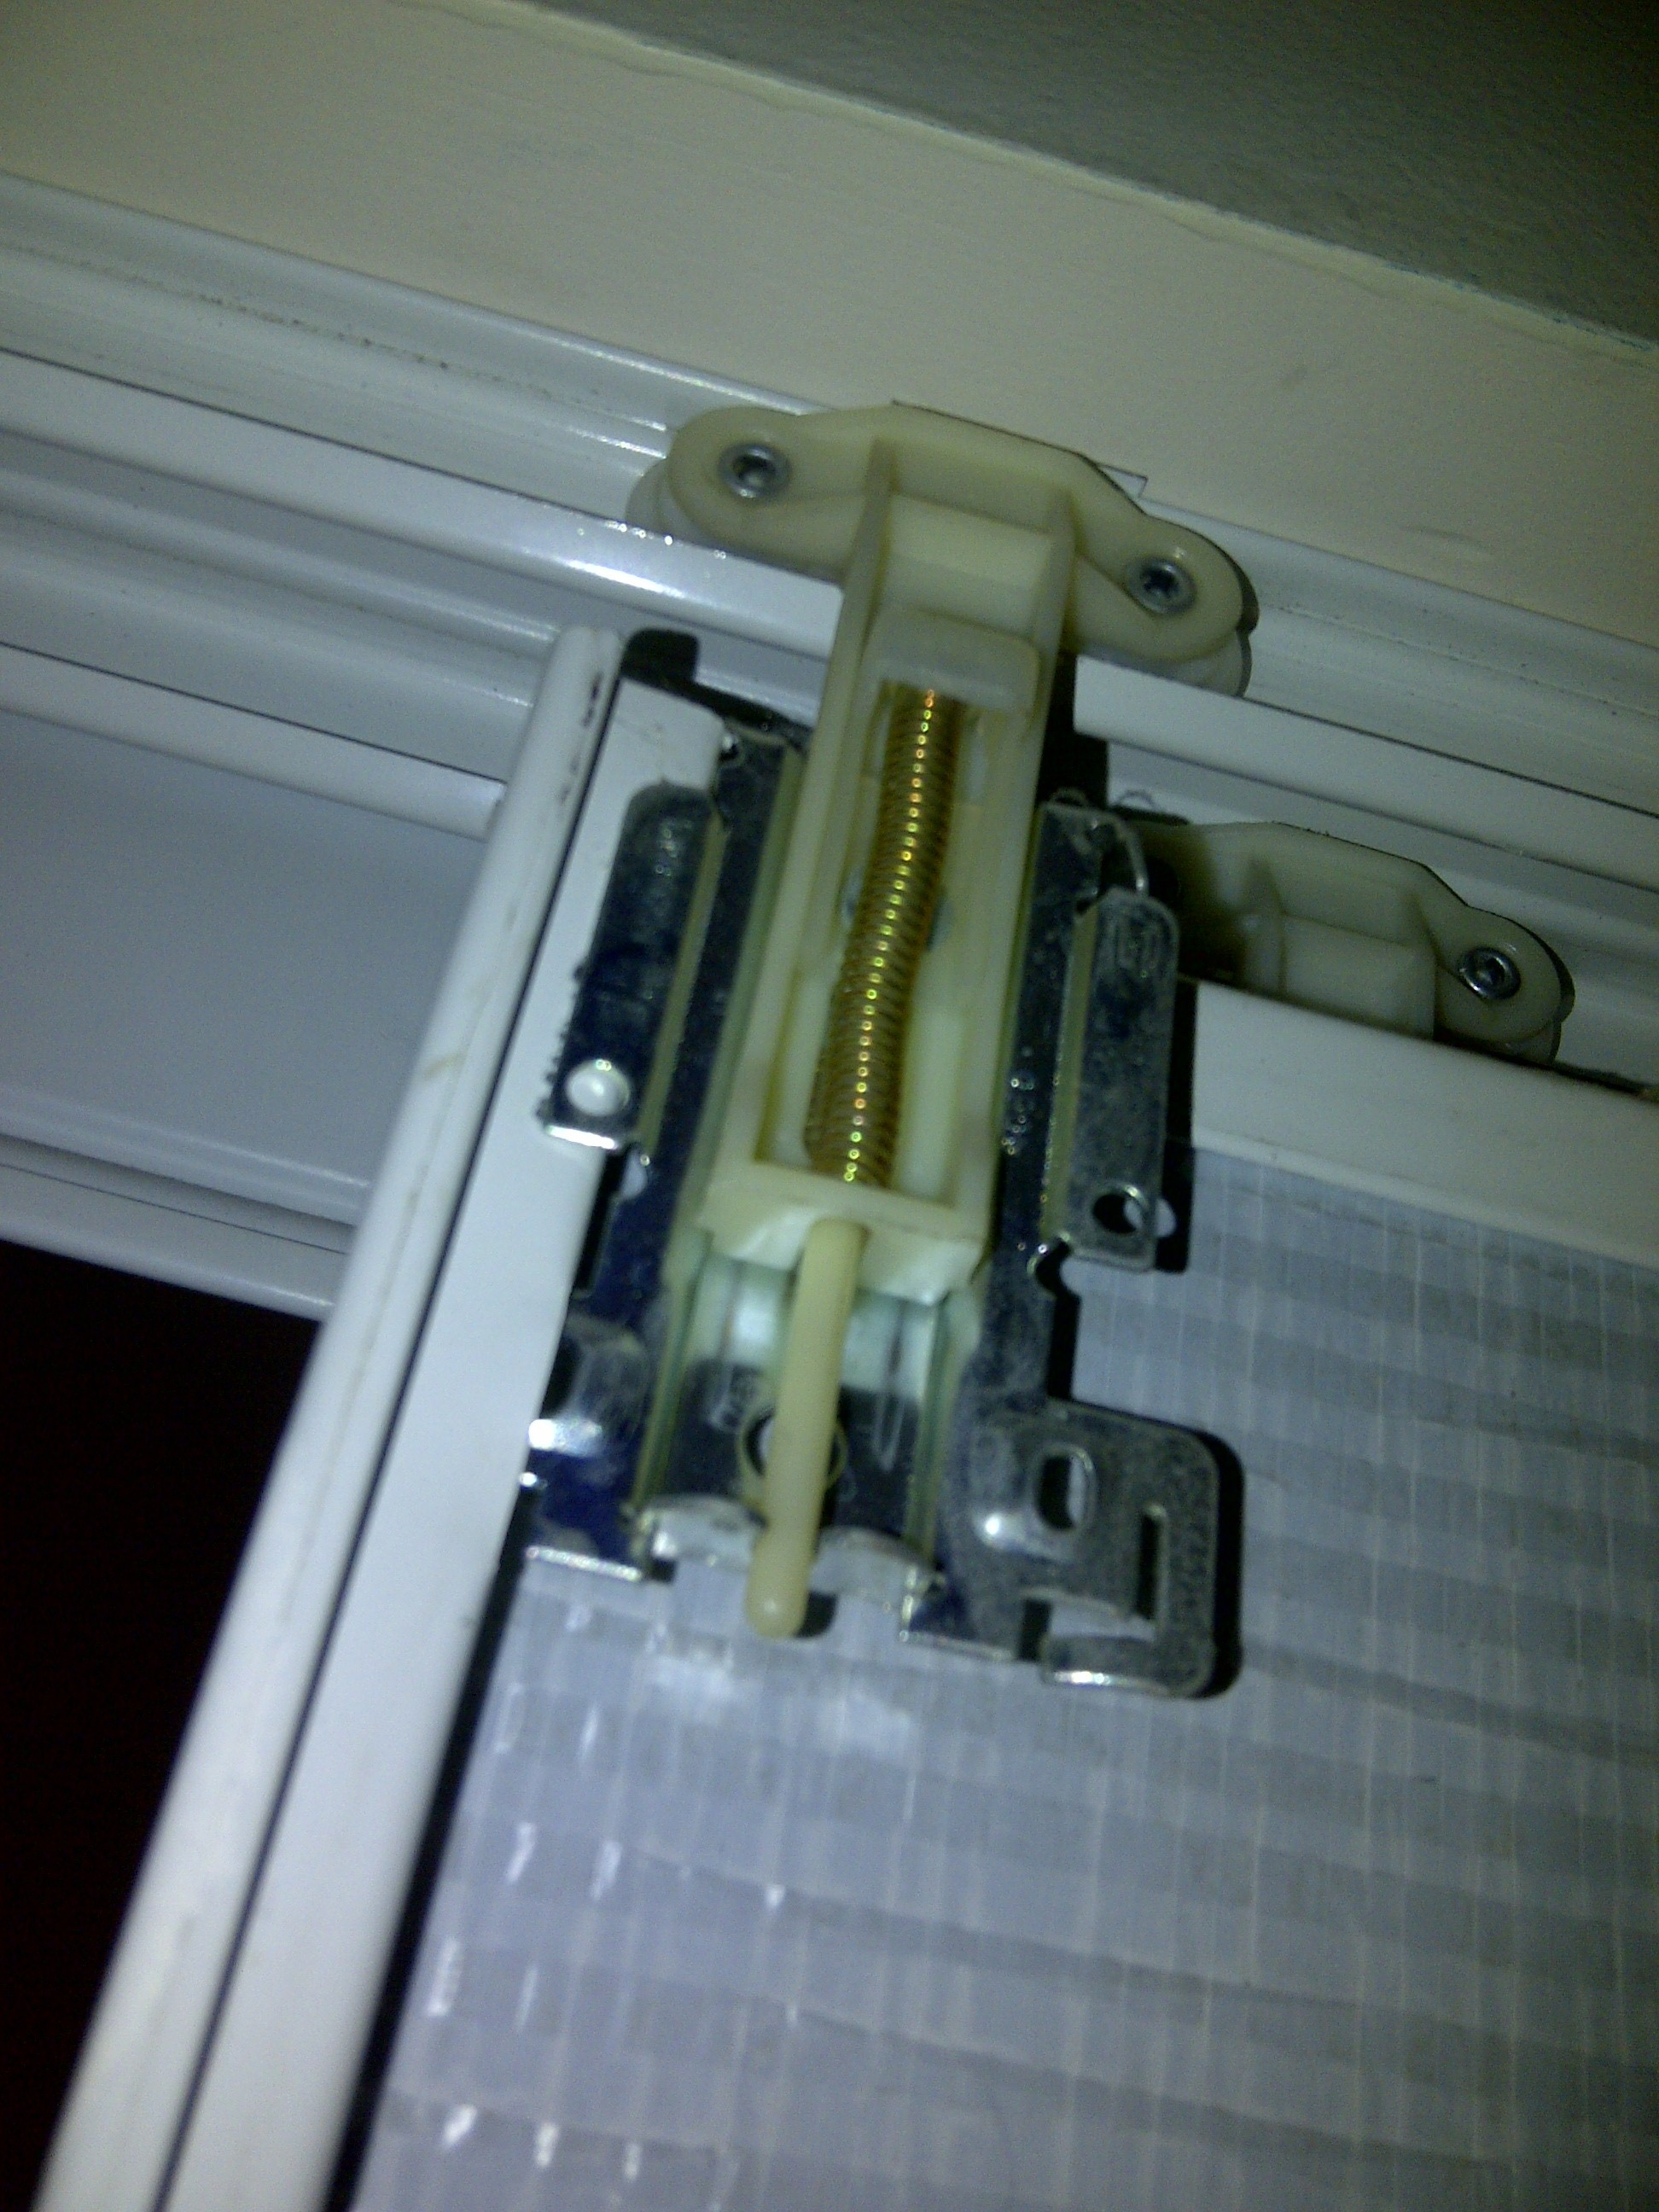 Brackets For Sliding Wardrobe Doors1944 X 2592